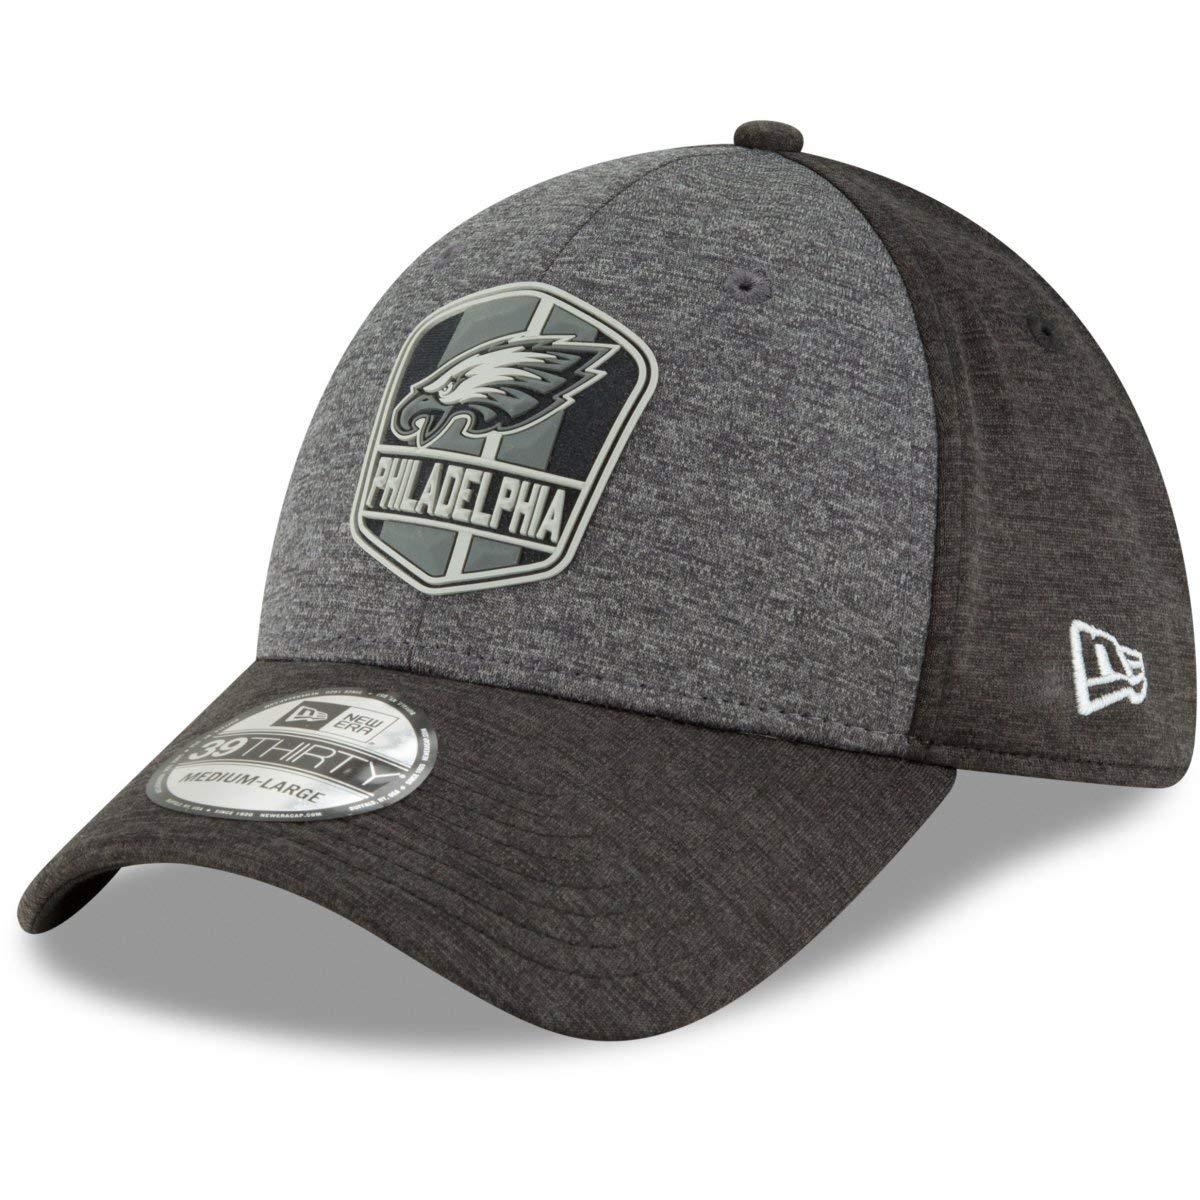 meet ea0c6 c6f5f Amazon.com  New Era Philadelphia Eagles 2018 NFL Sideline Official 39THIRTY  Flex Hat –Black Grey  Sports   Outdoors